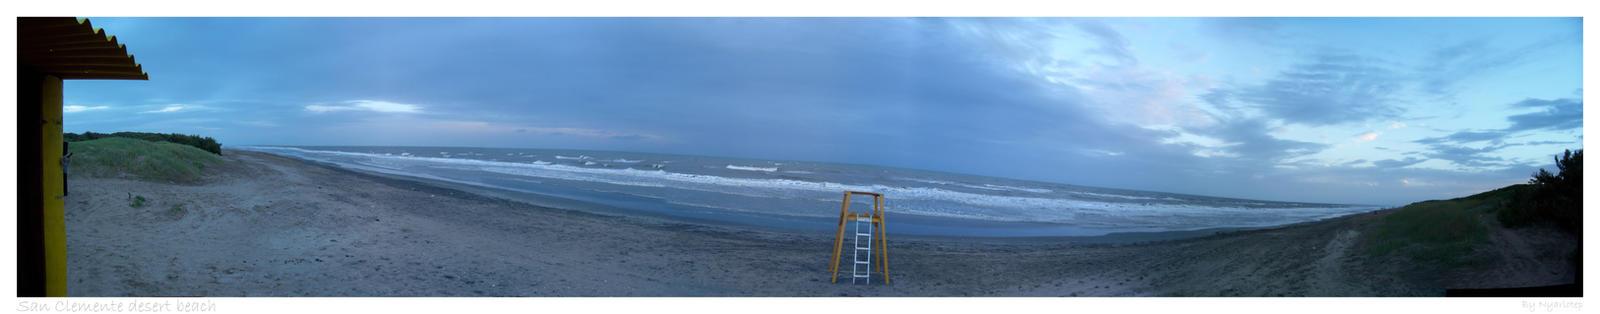 San Clemente Desert Beach by Nyarlotep